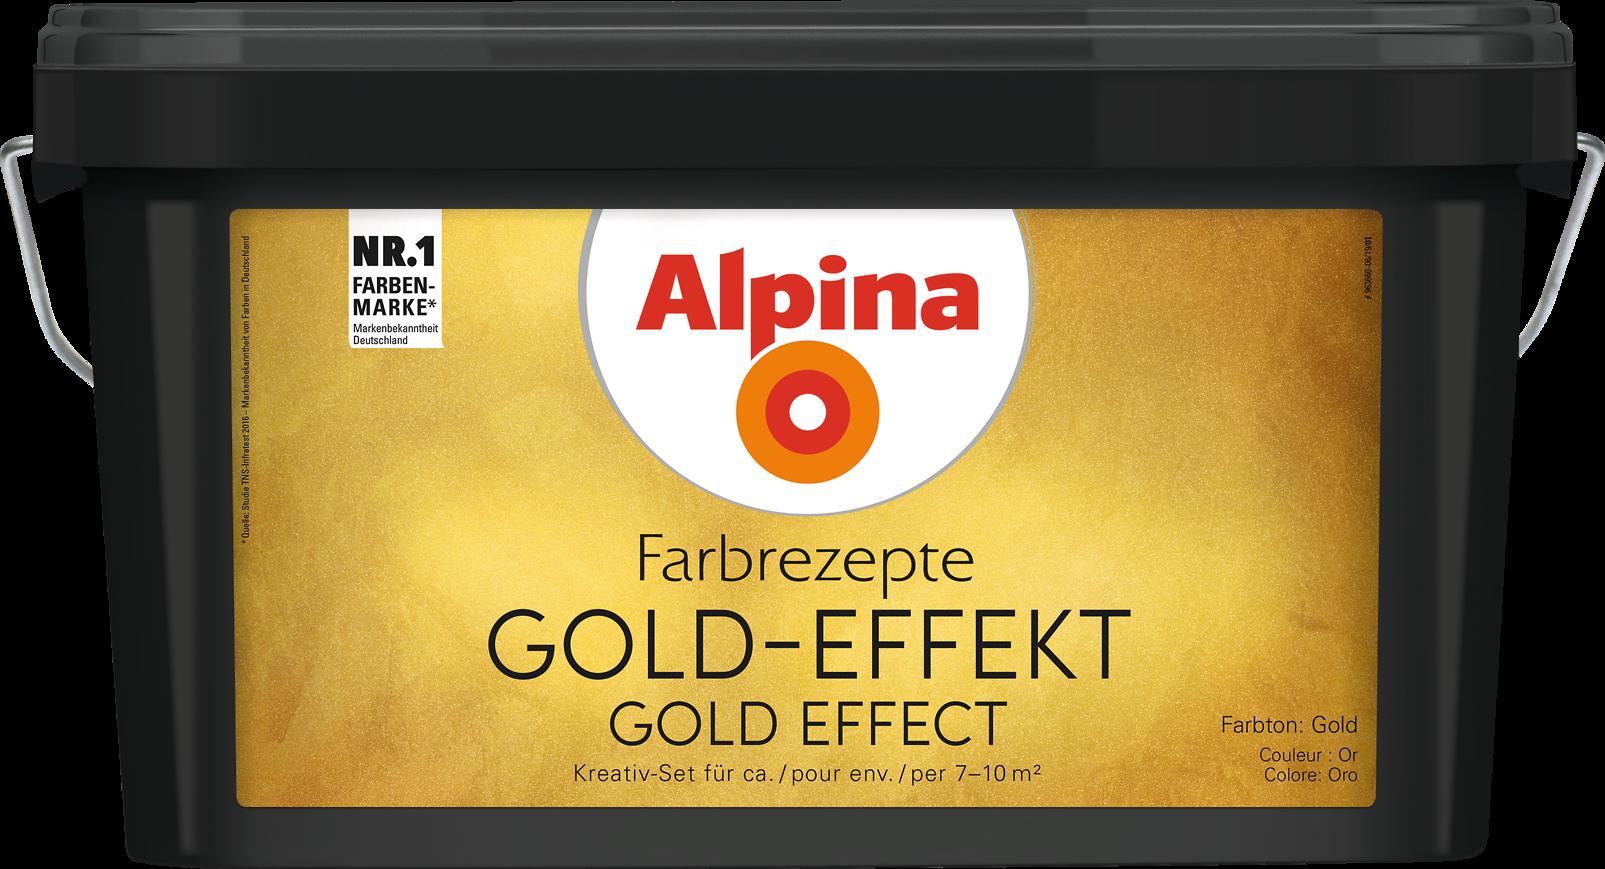 Alpina Farbrezepte GOLD EFFEKT